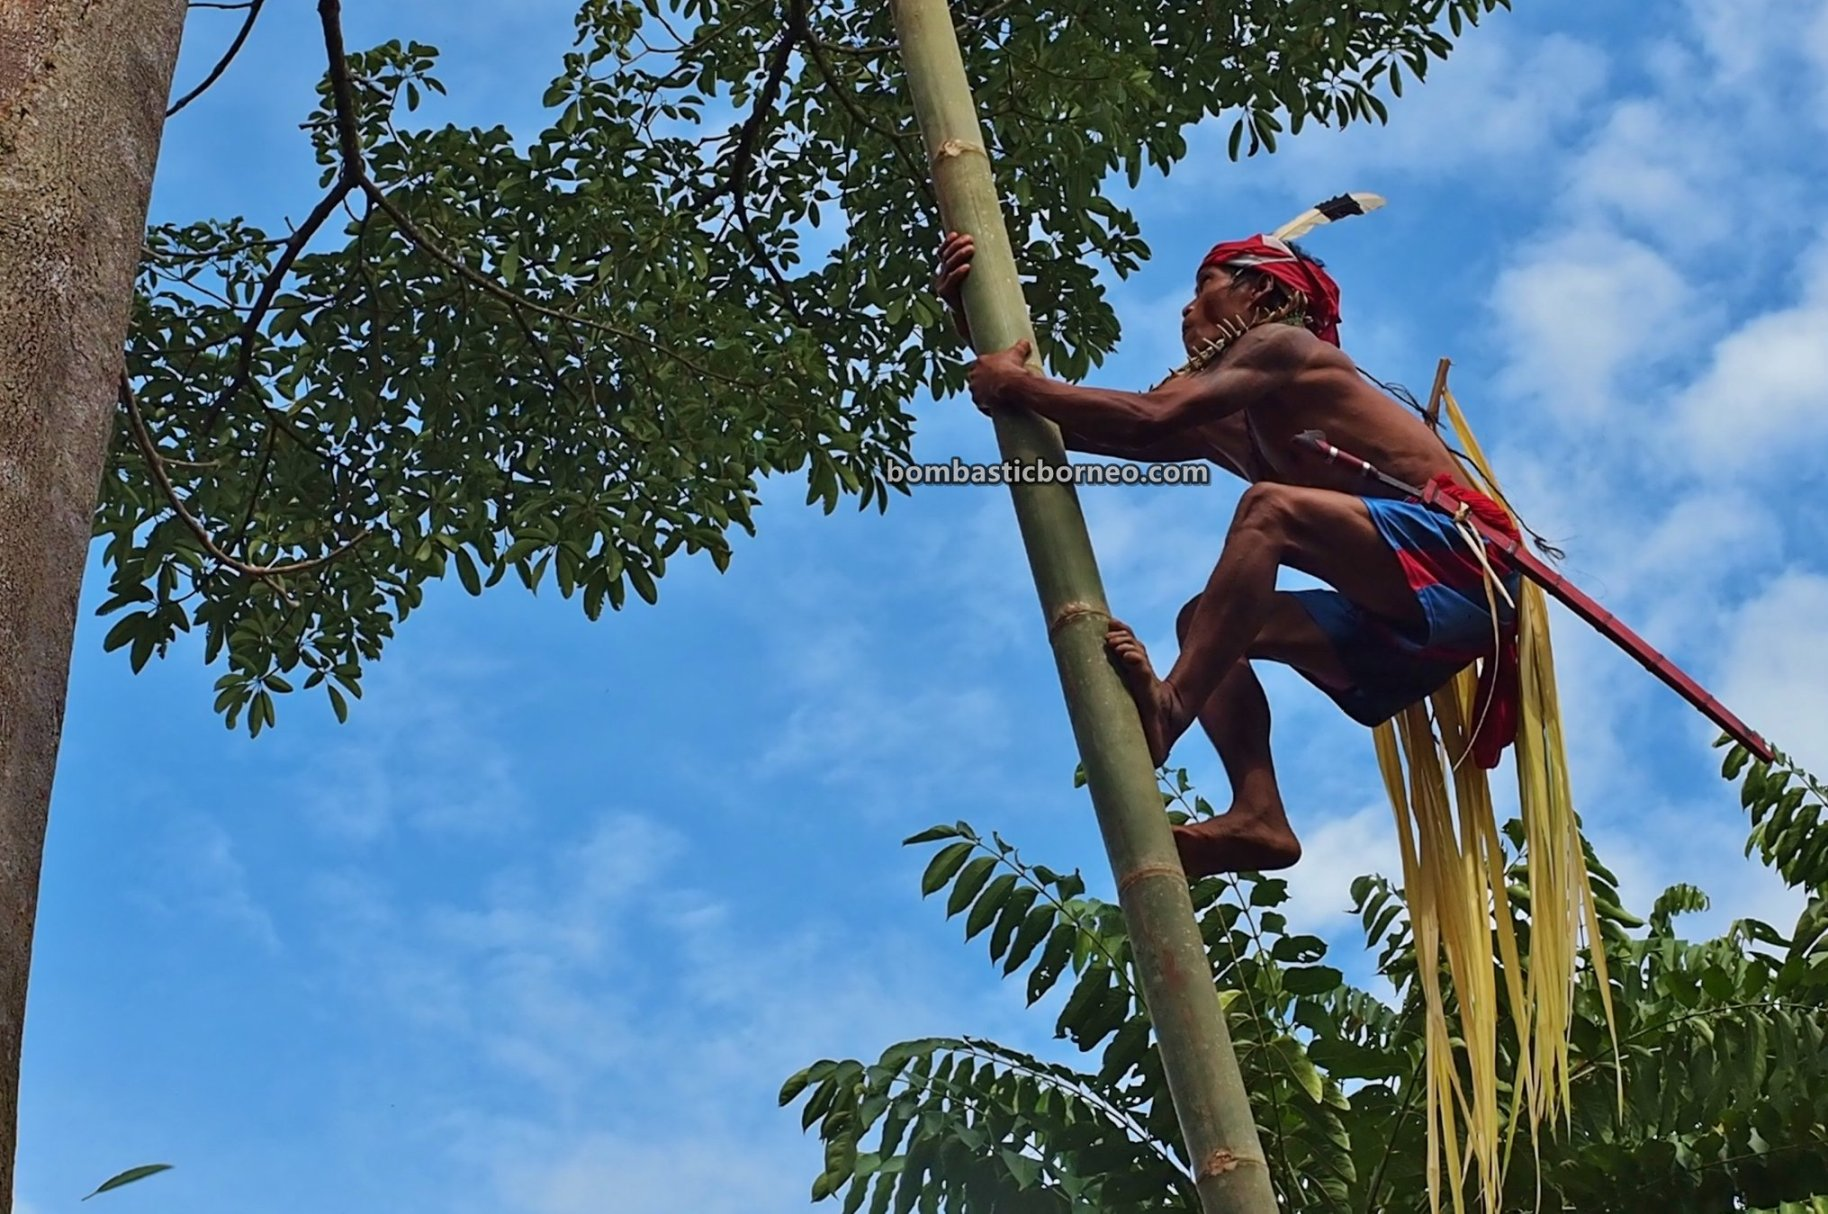 Bamboo climbing, Paddy Harvest Festival, adventure, traditional, budaya, Bengkayang, Desa Sahan, Dayak Bidayuh, Native, Tourism, tourist attraction, travel guide, Borneo, 探索婆罗洲游踪, 西加里曼丹原住民文化, 孟加映达雅丰收节,